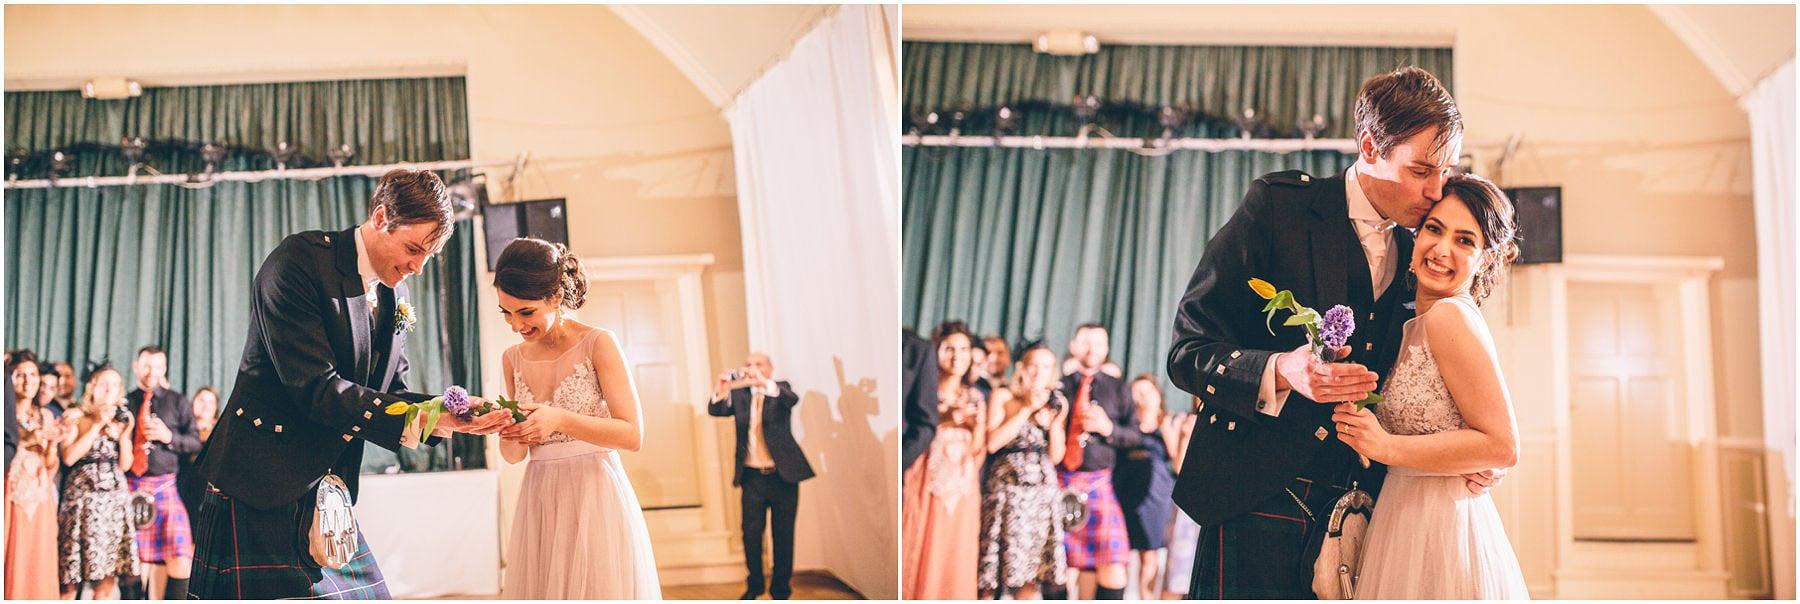 Bowdon_Rooms_Wedding_Photography_0112